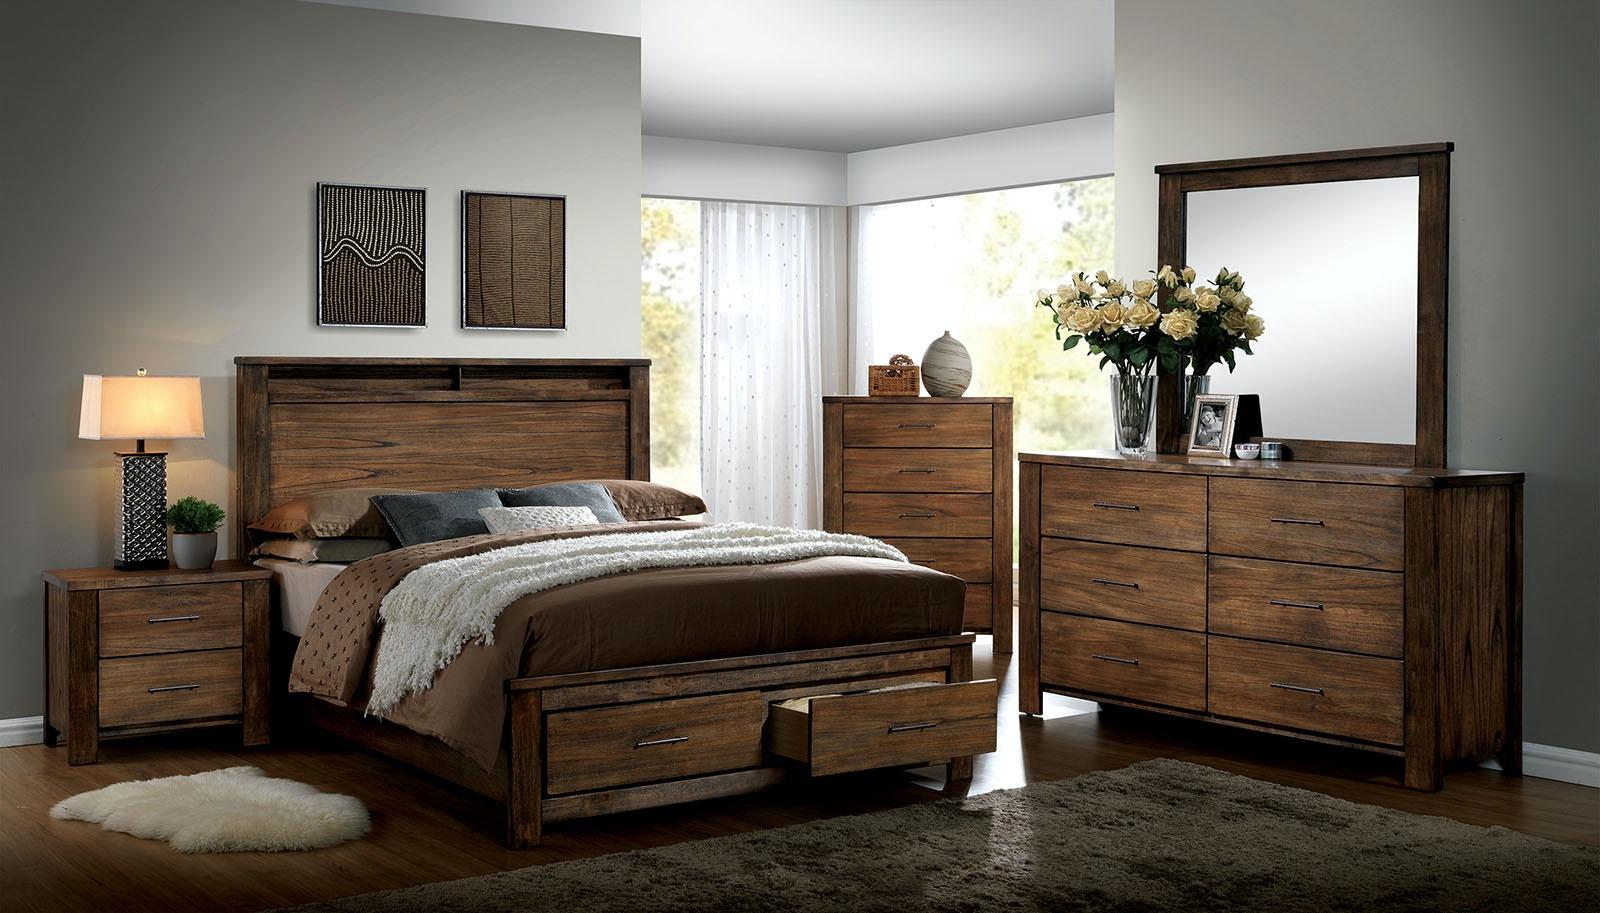 Genial Furniture Of America Cal.King Bed CM7072CK BED